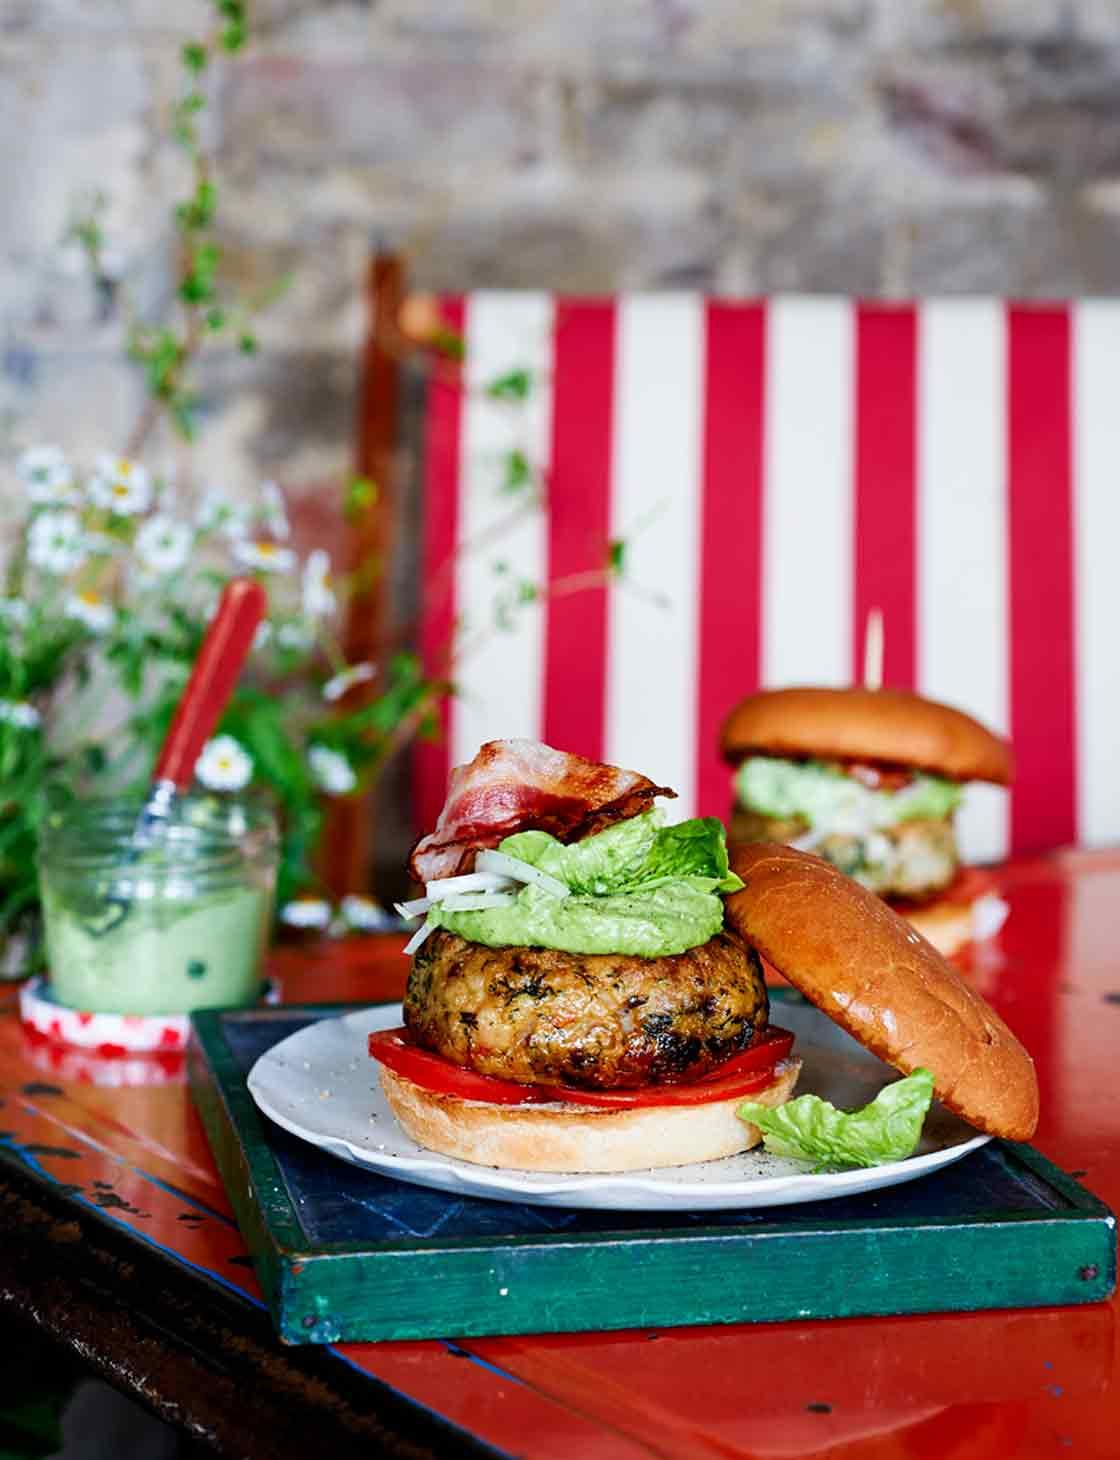 Tom Kerridge S Fish Burgers With Herb Mayonnaise Sainsbury S Magazine